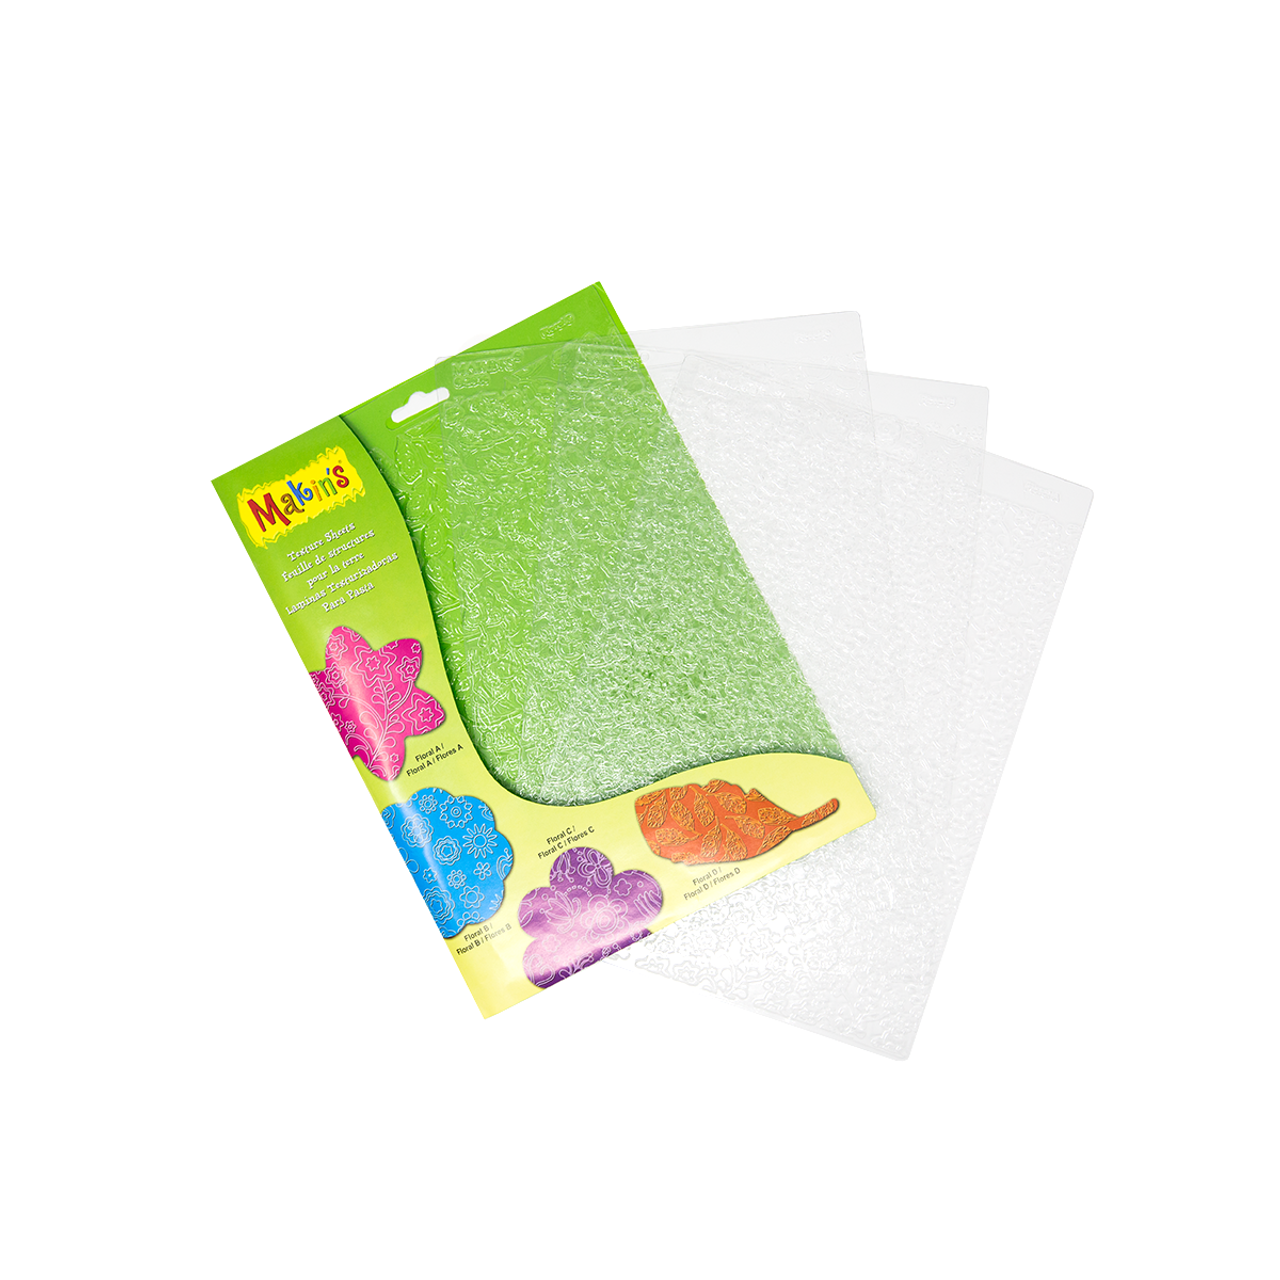 Makin's Large Texture Sheets - Floral Set